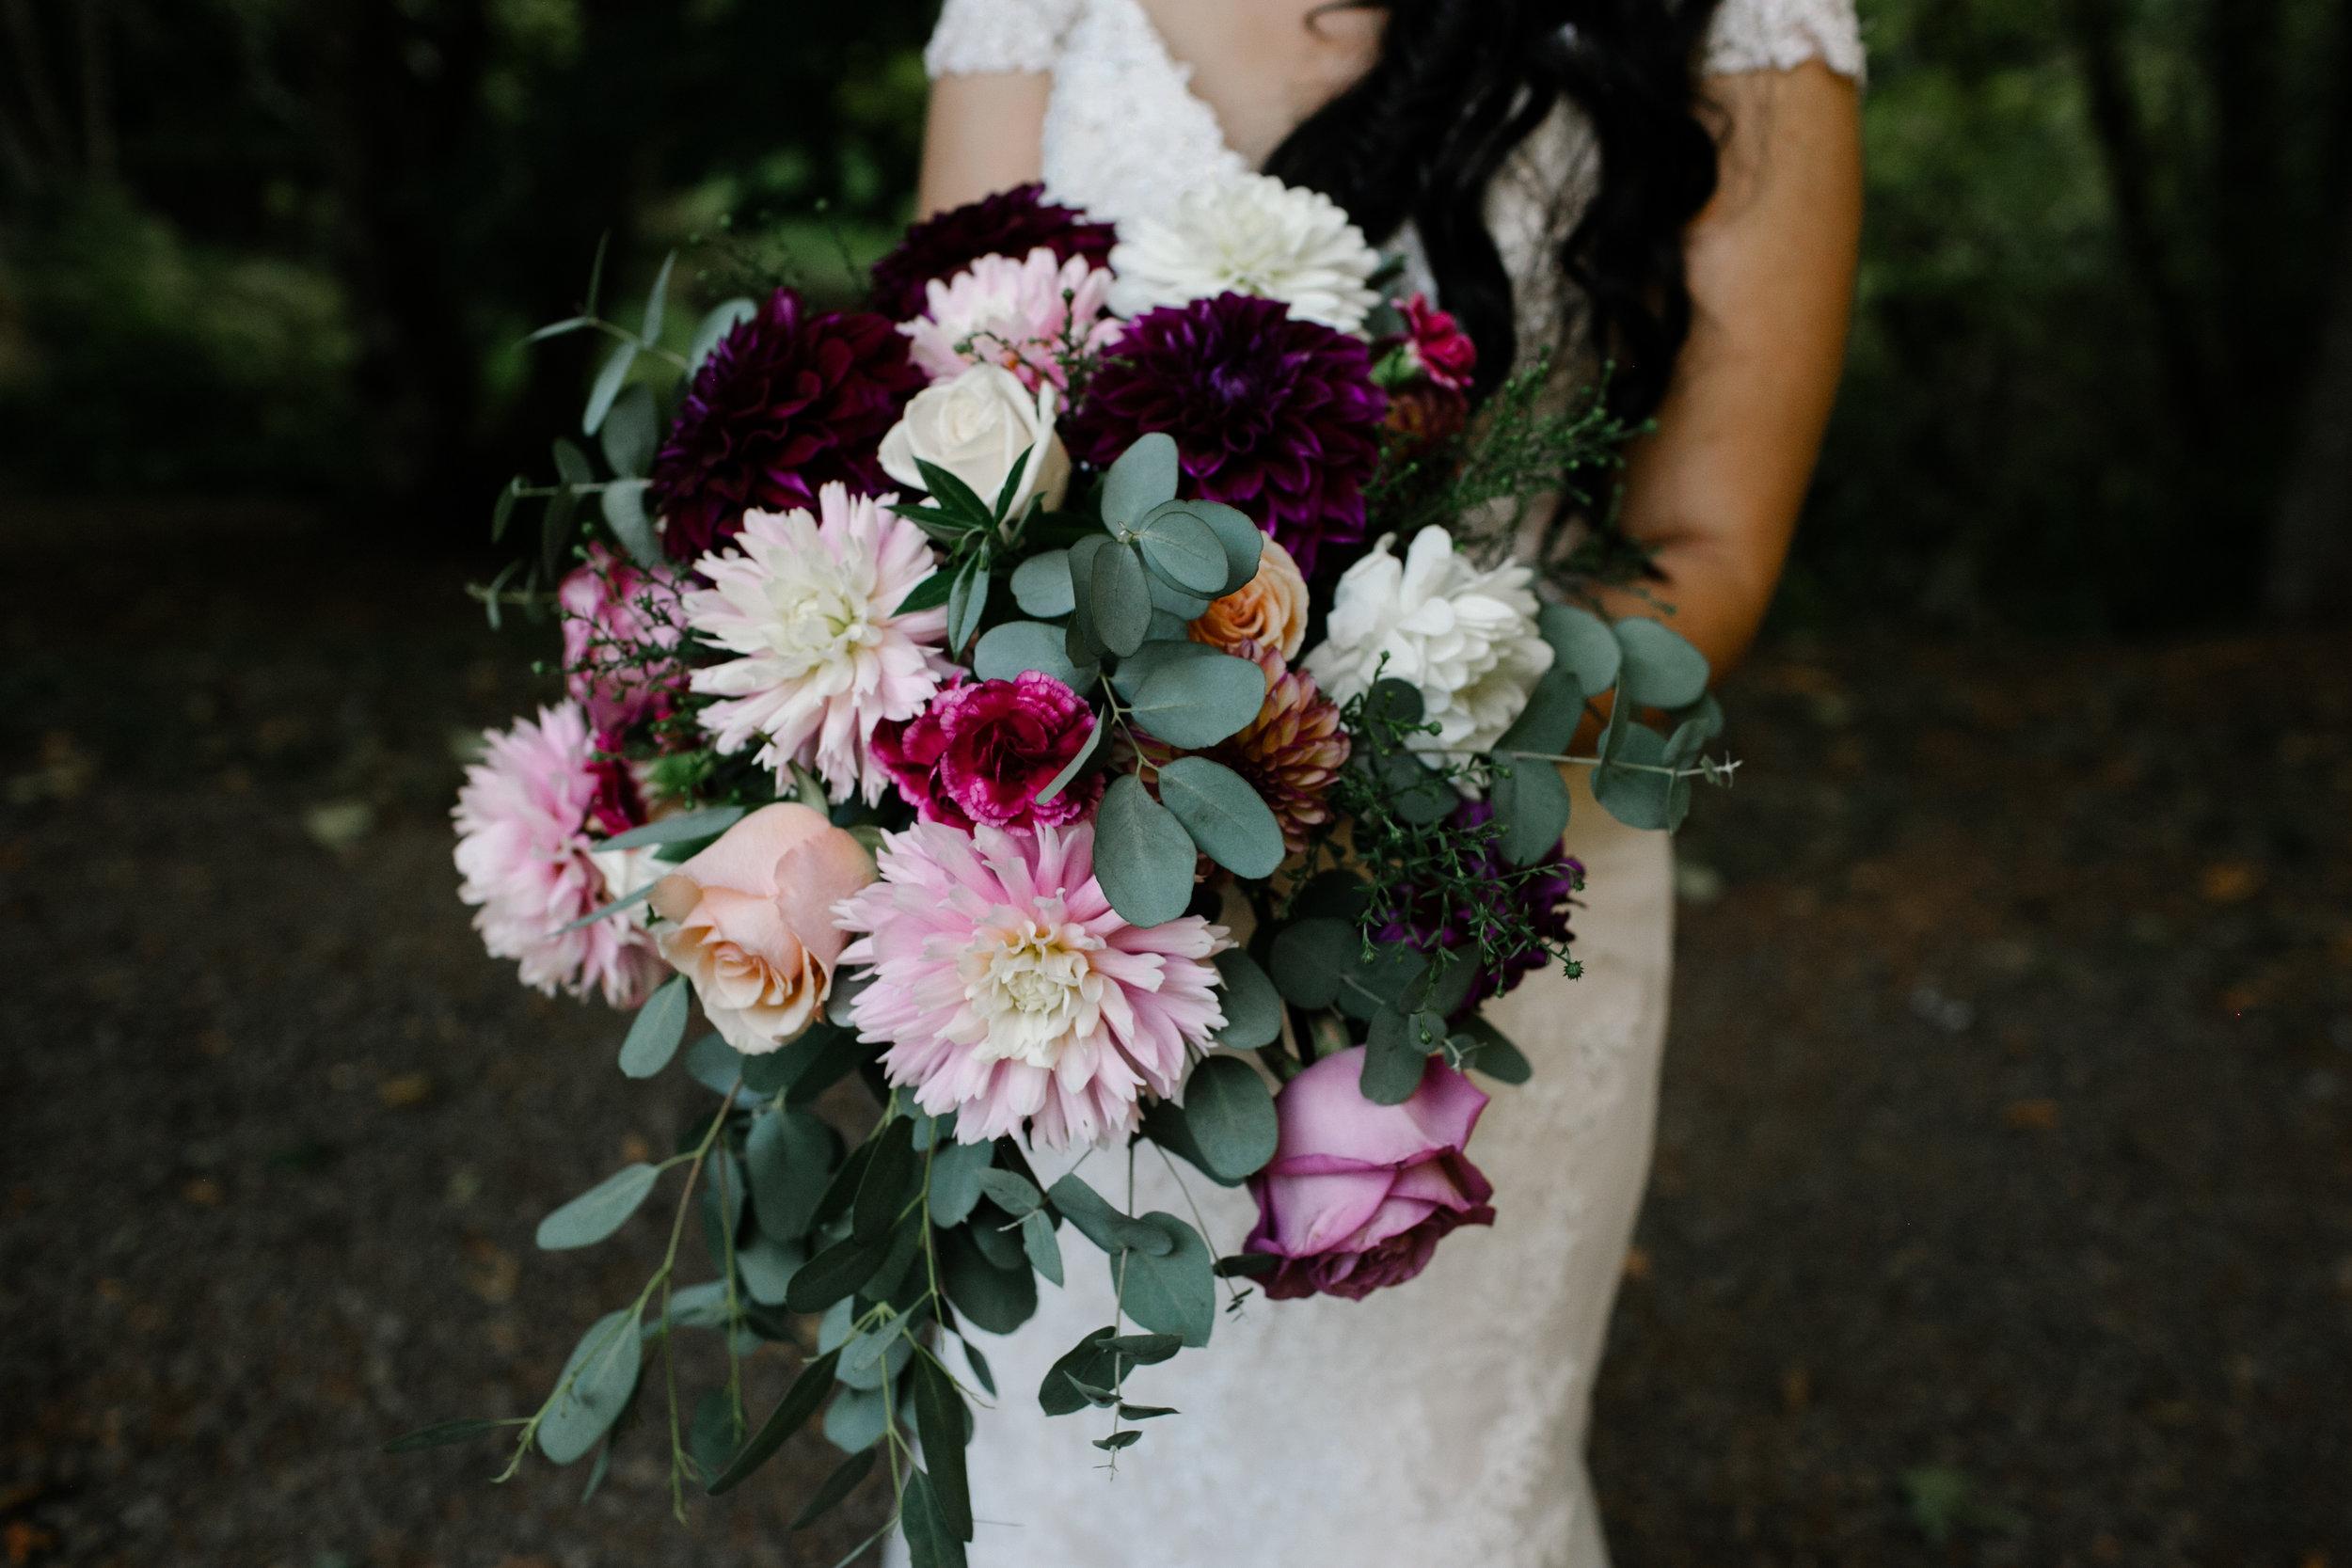 Sevlynn-Photography-Teresa-Chandler-Wedding-28.jpg